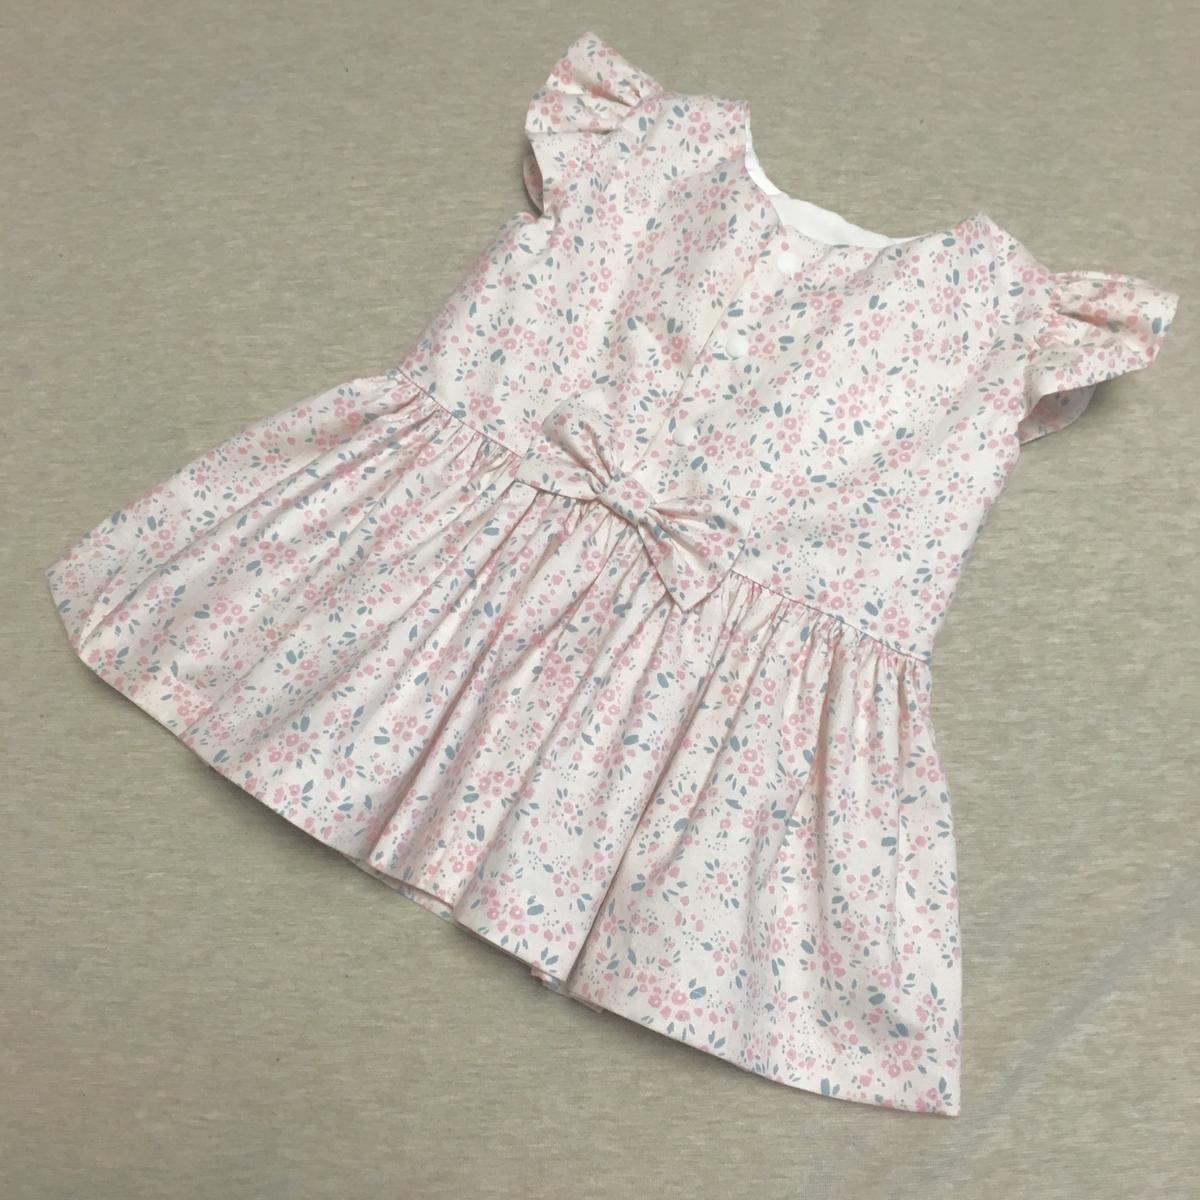 f:id:maruko-craftmade:20191021220856j:plain